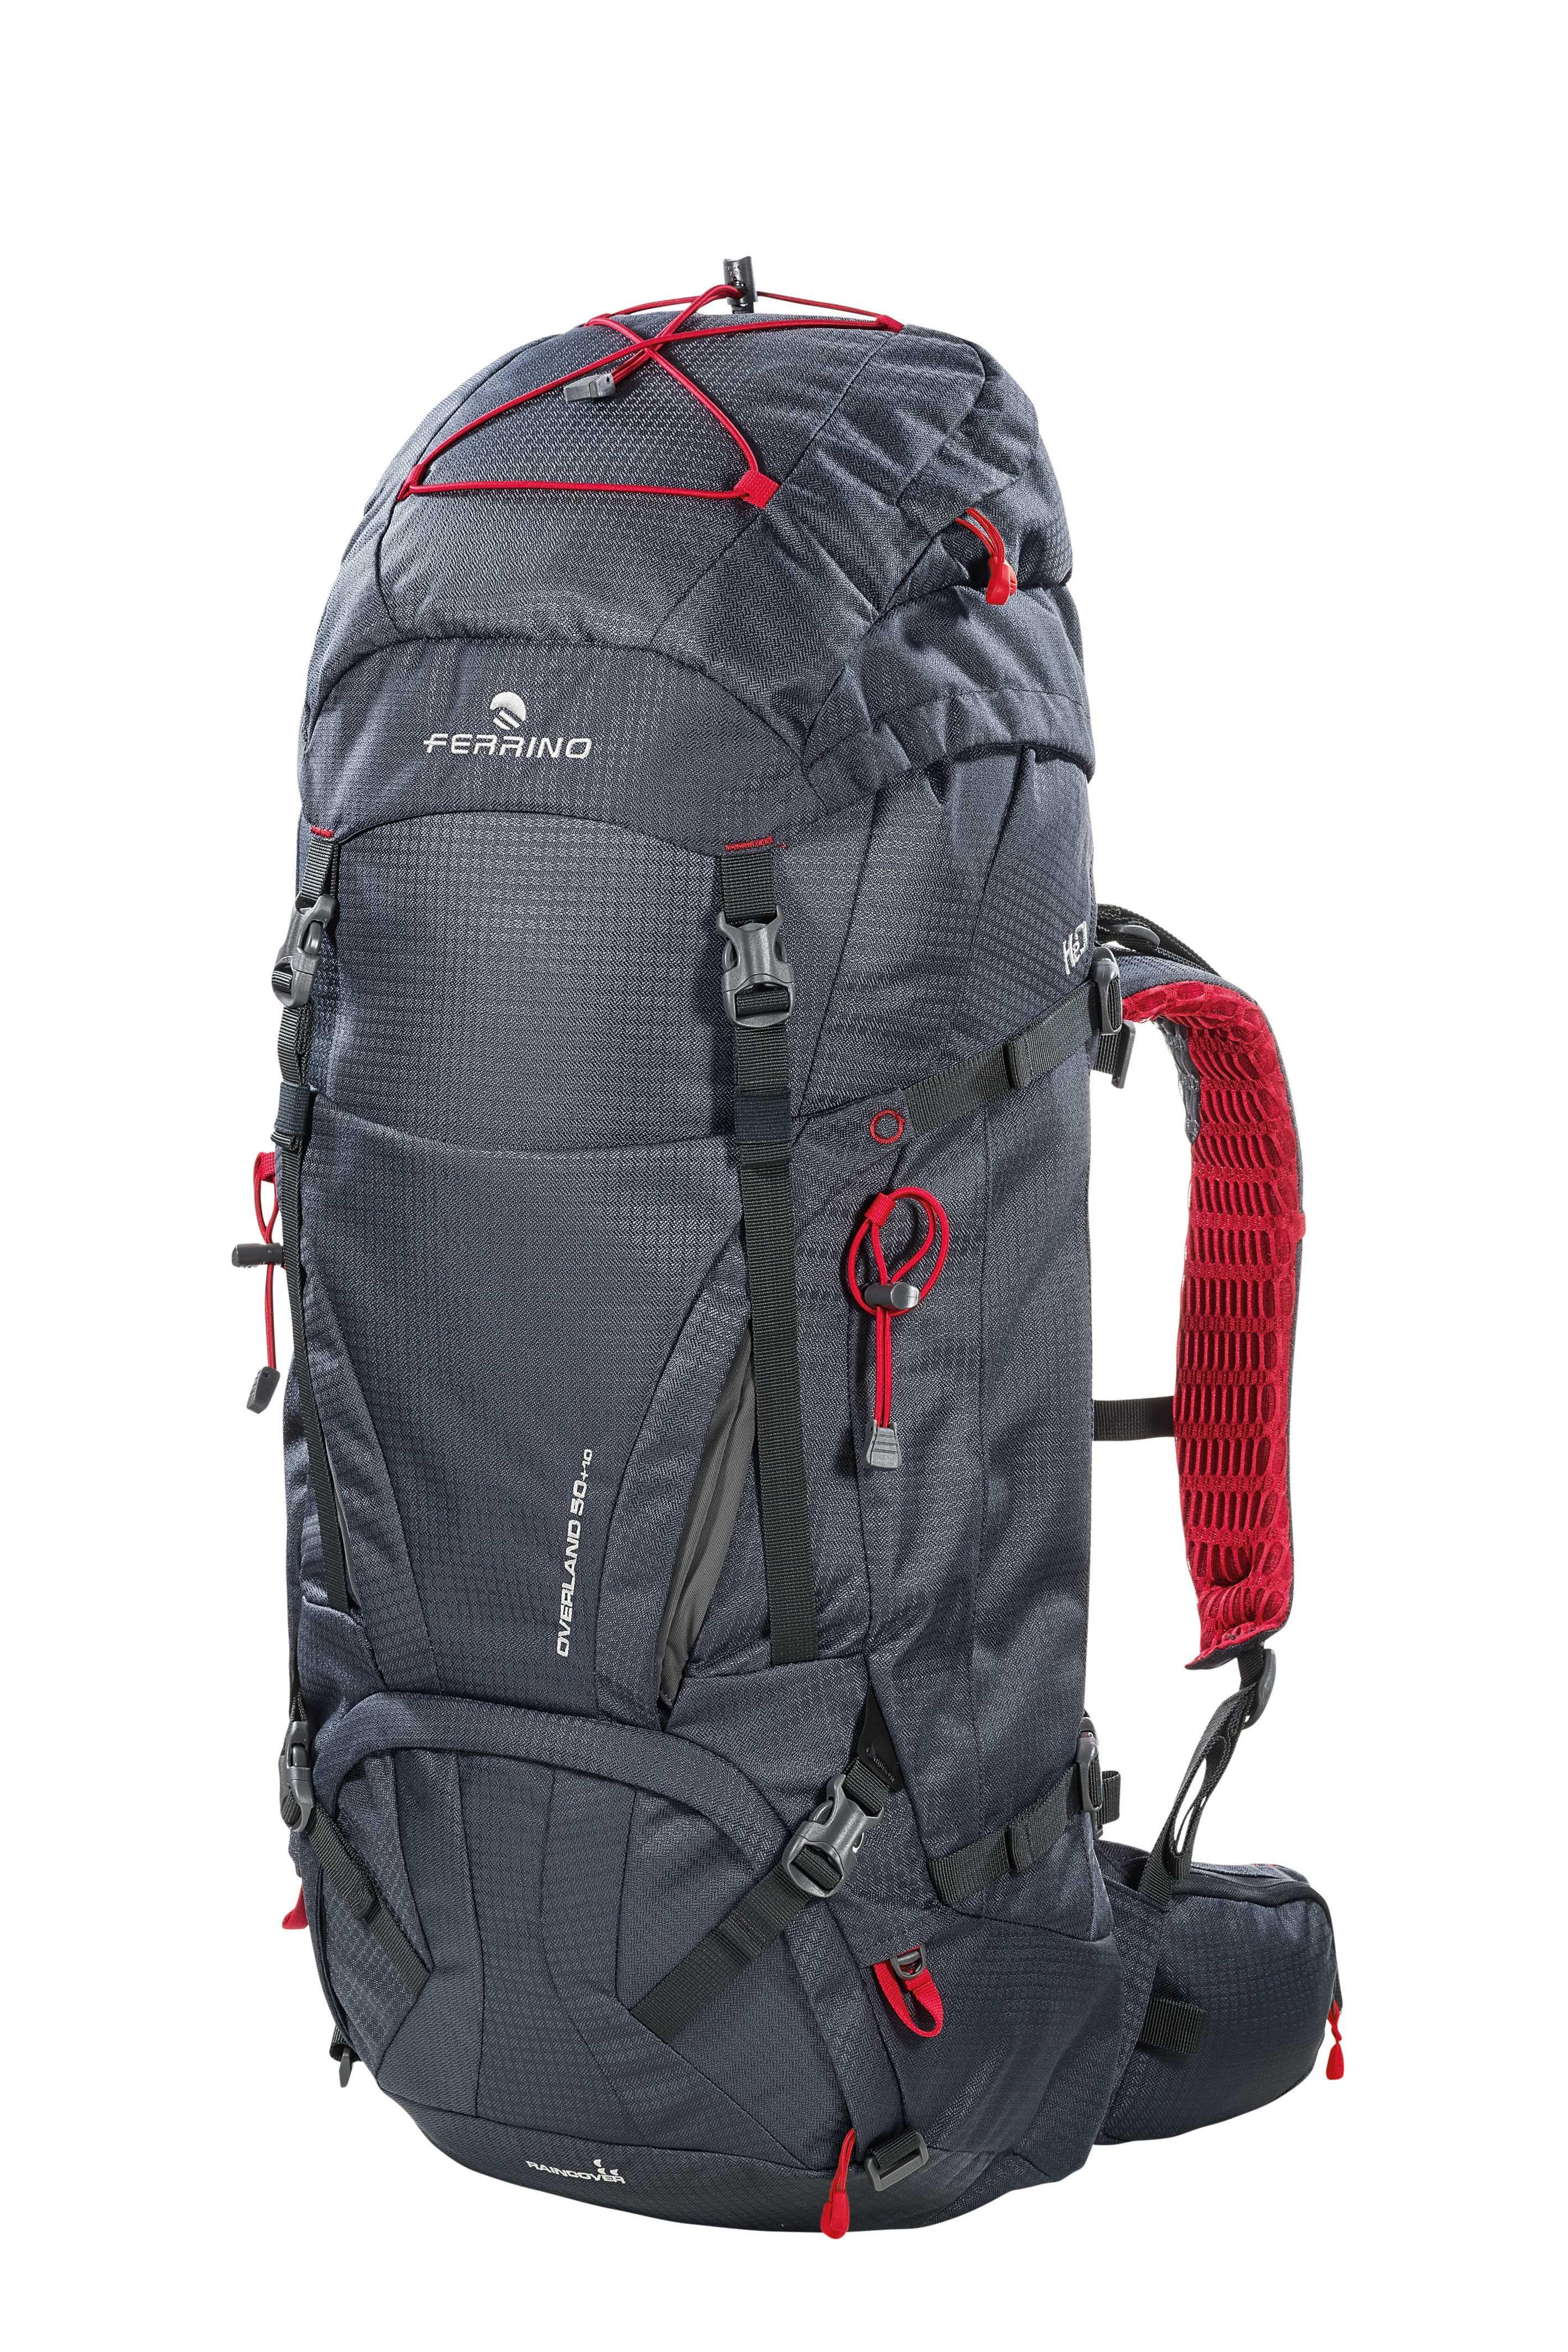 Turistický batoh Ferrino Overland 50+10 NEW f47e85788b